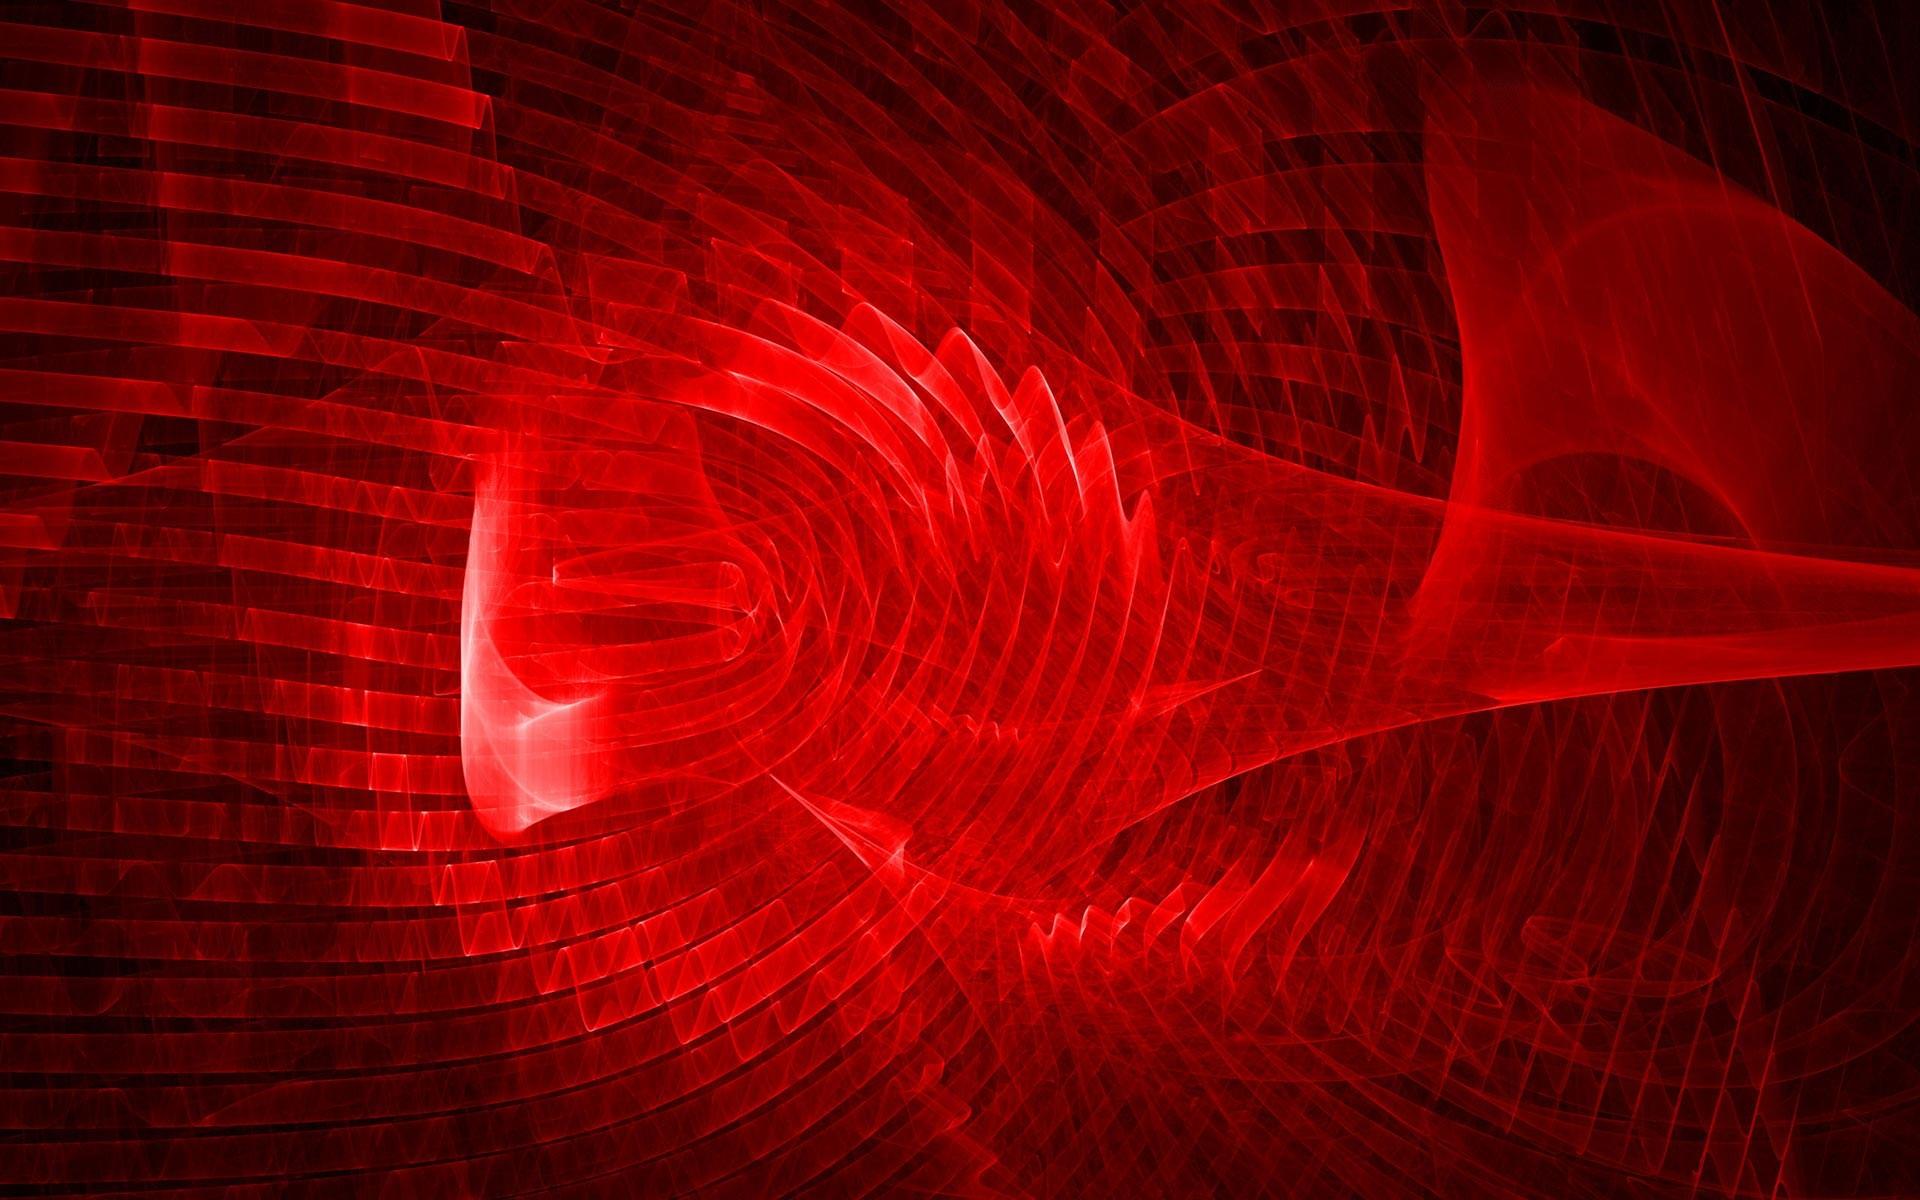 Glamourous Red Apple Slices desktop wallpaper, Glamourous Red Apple Slices  background, Glamourous Red Apple Slices HD wallpaper – image resolution …